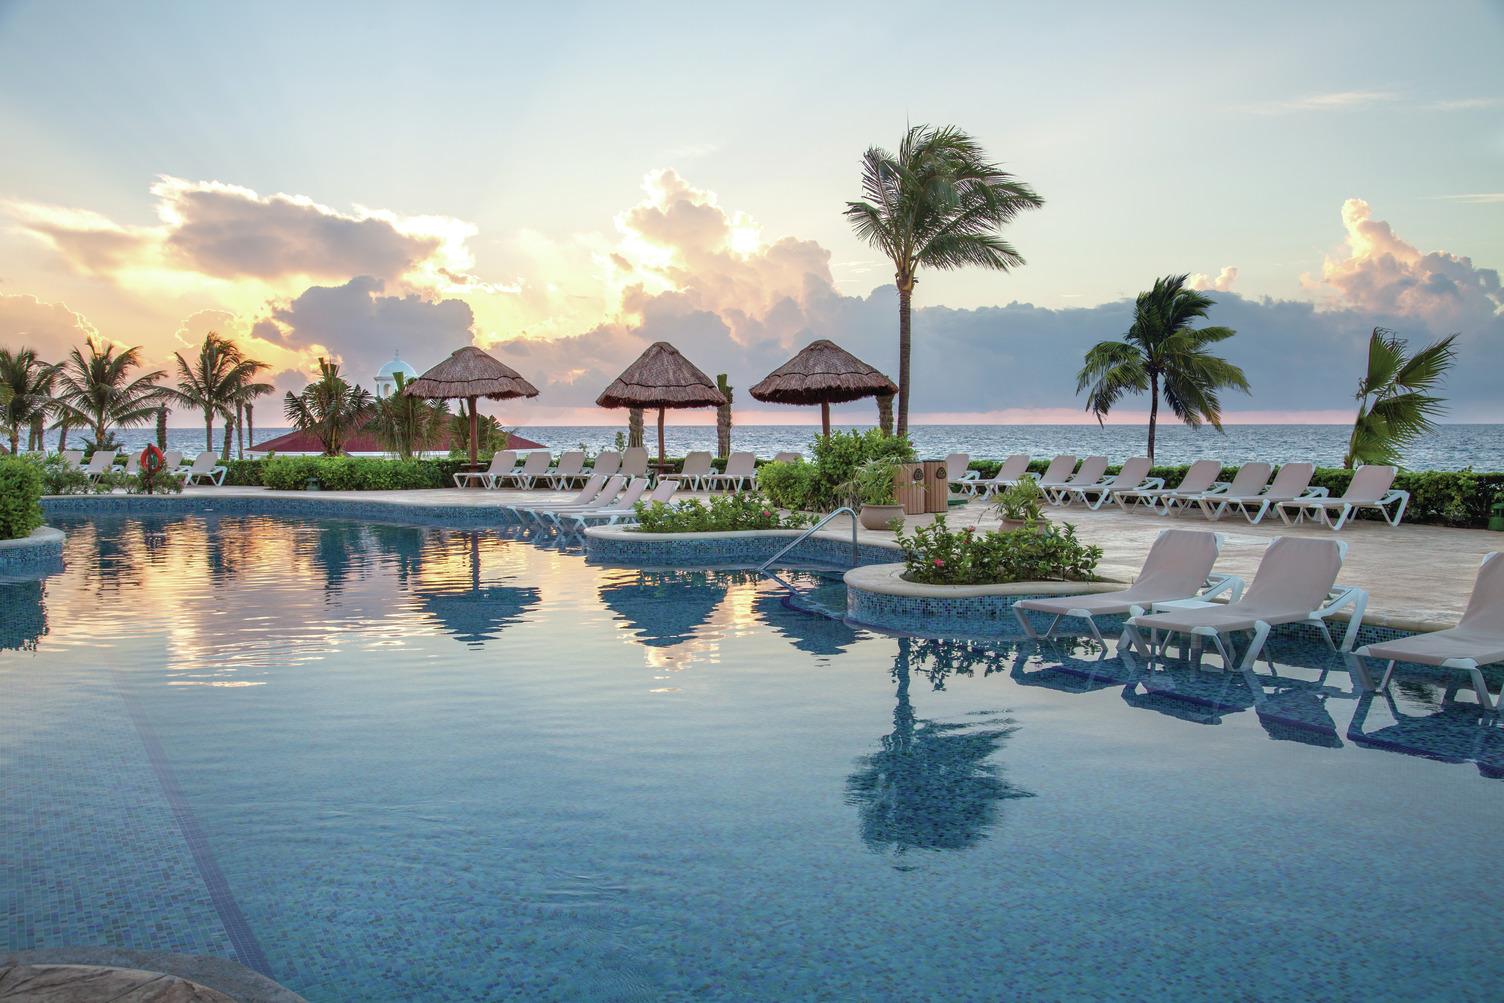 Travel Agency All-Inclusive Resort Heaven at Hard Rock Hotel Riviera Maya 15